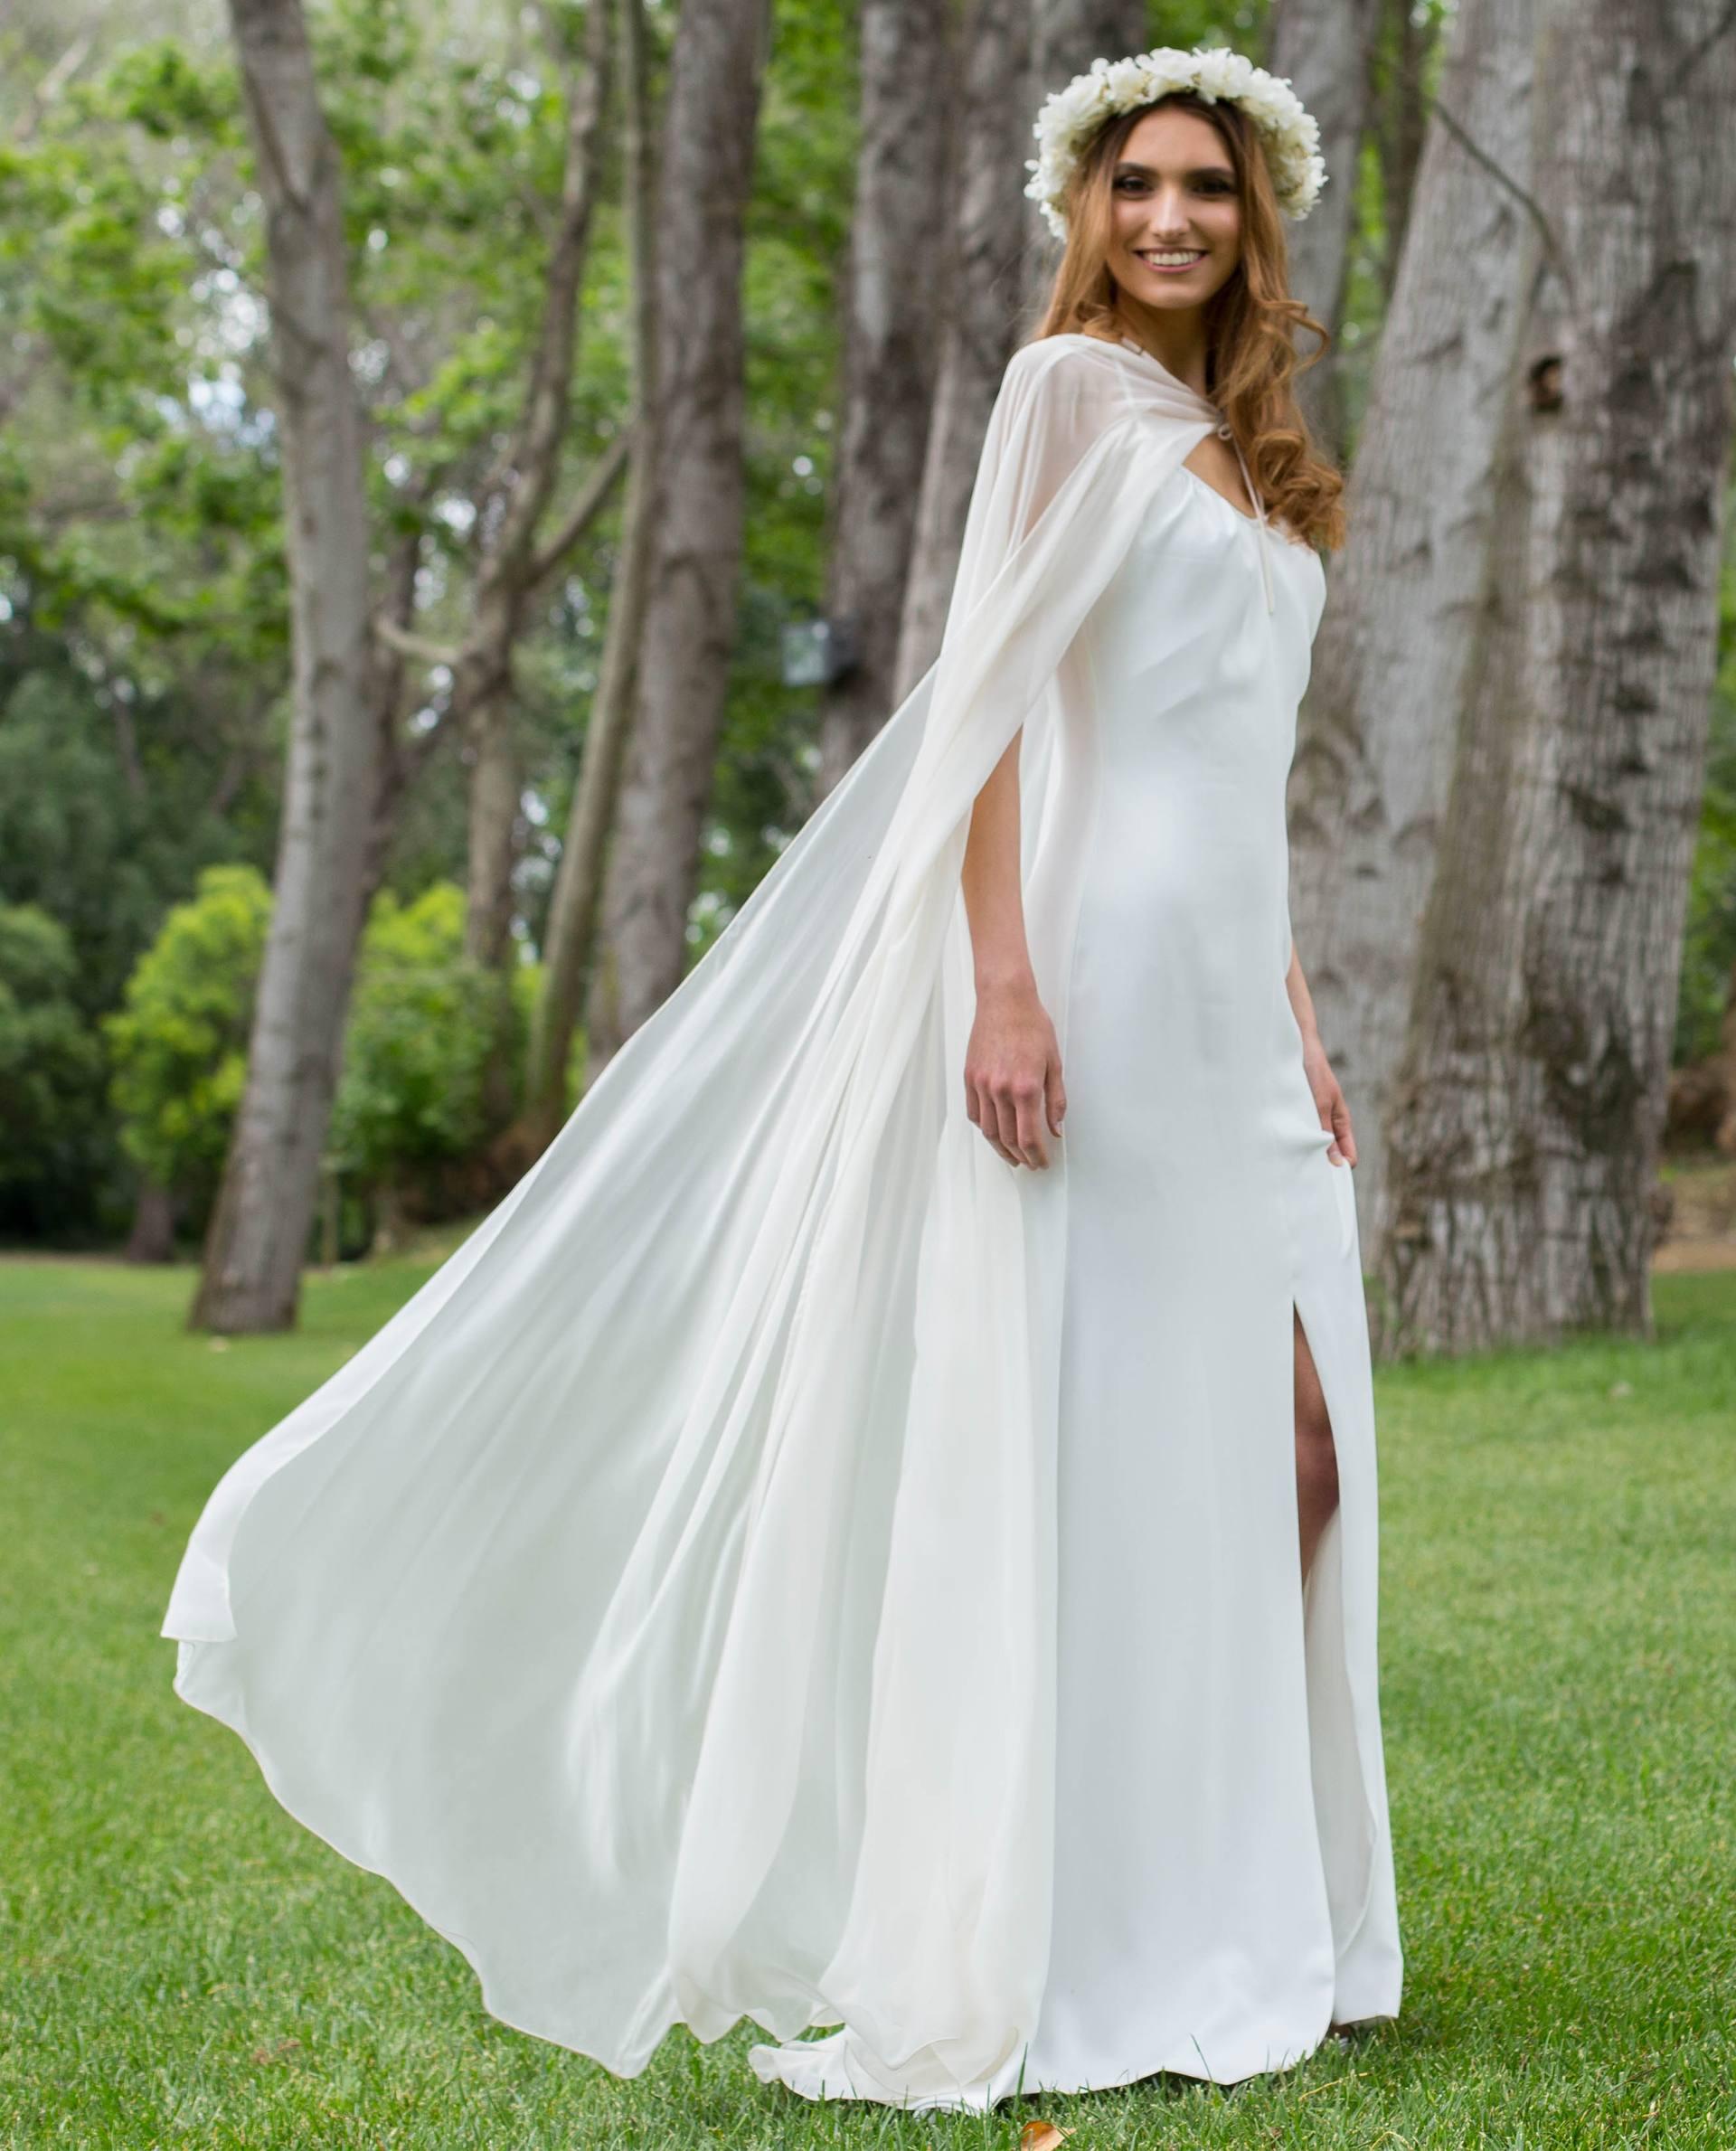 BRIDAL-NATURE 2018/19 - VESTIDOS - Vestido novia Rebeca con capa Nelda